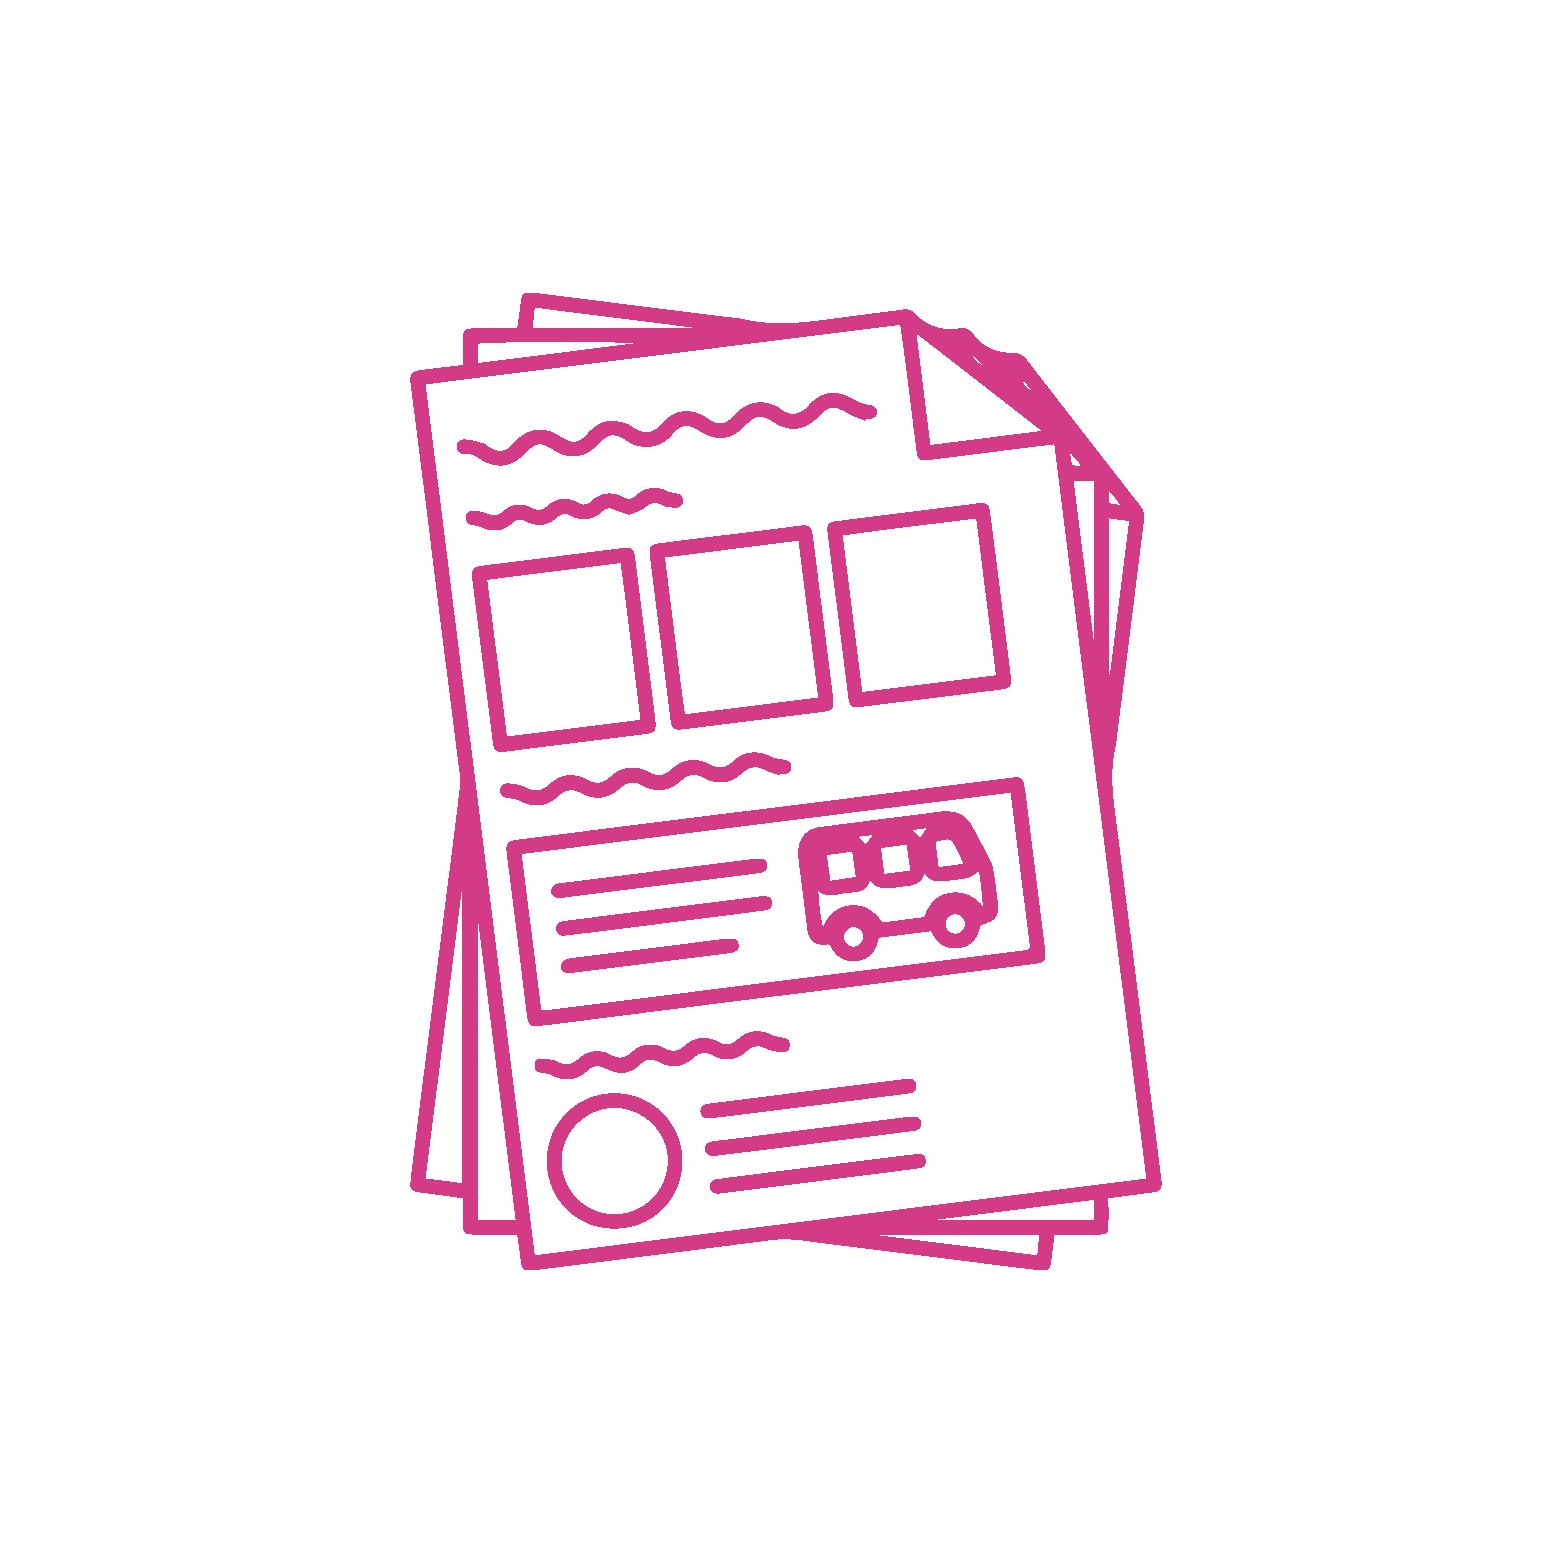 Design Sprint - Esquisser / Sketch Icone